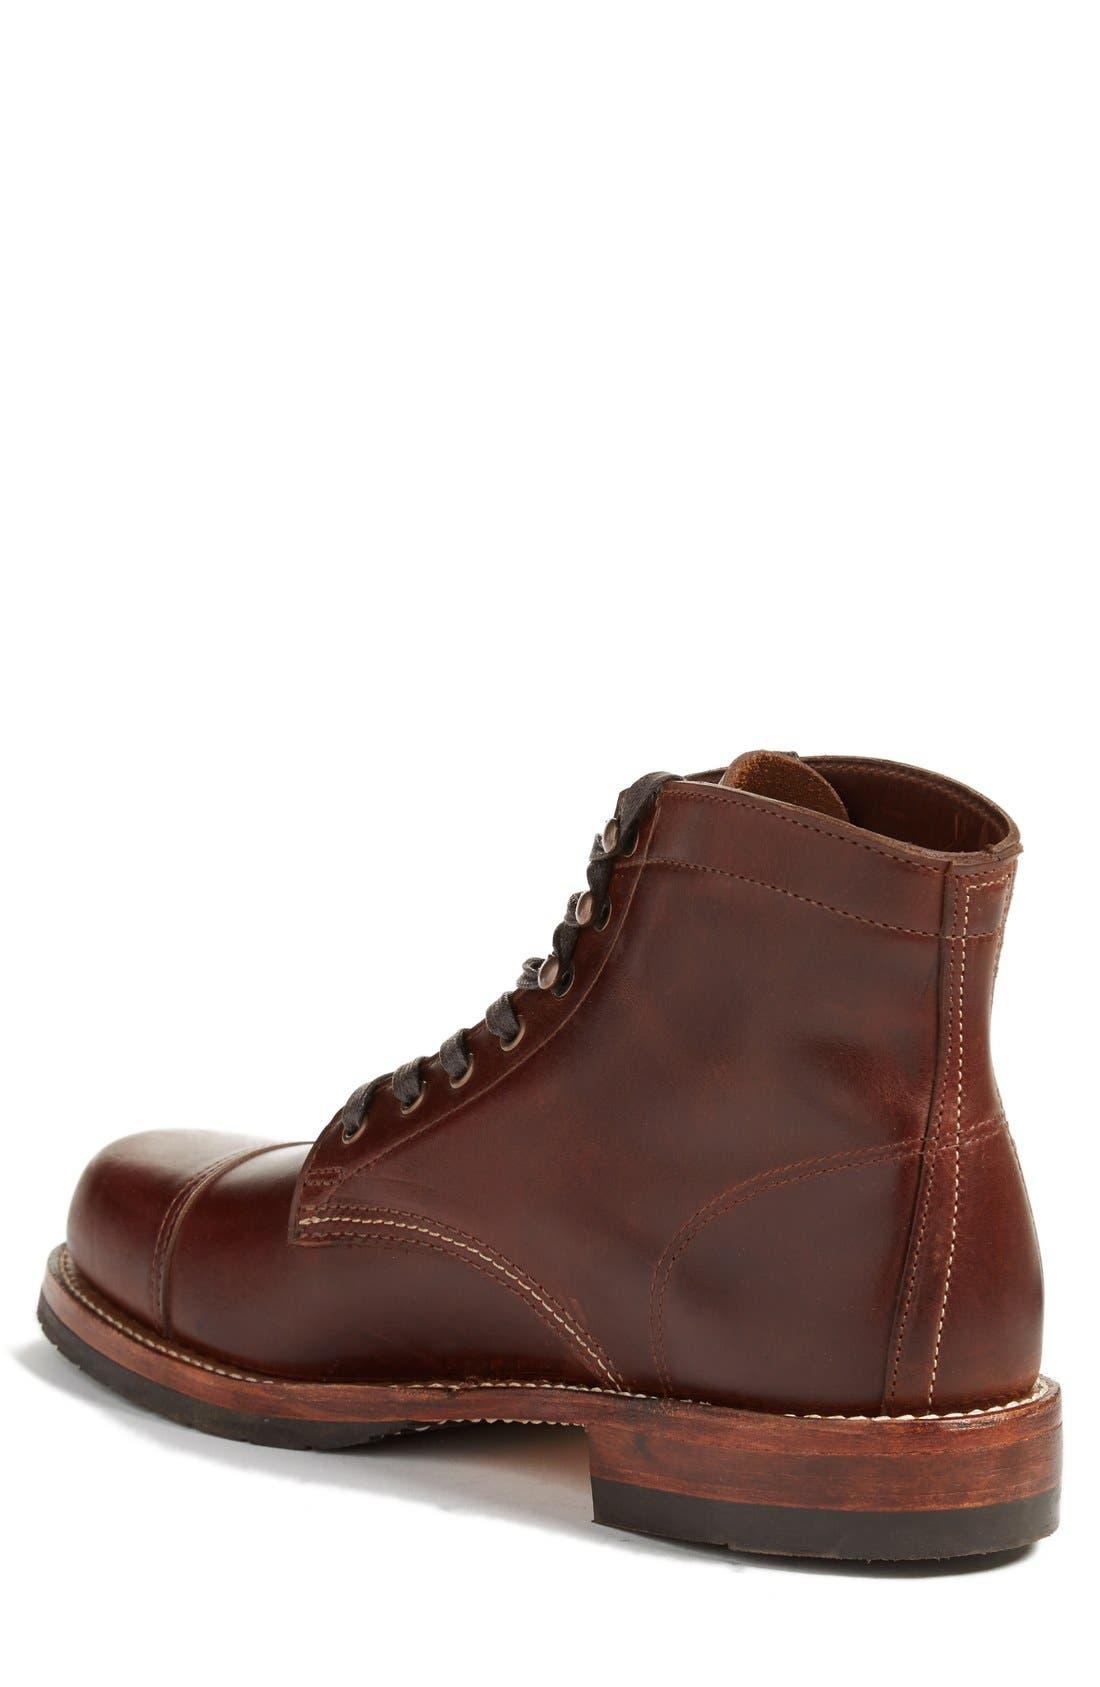 'Adrian' Cap Toe Boot,                             Alternate thumbnail 4, color,